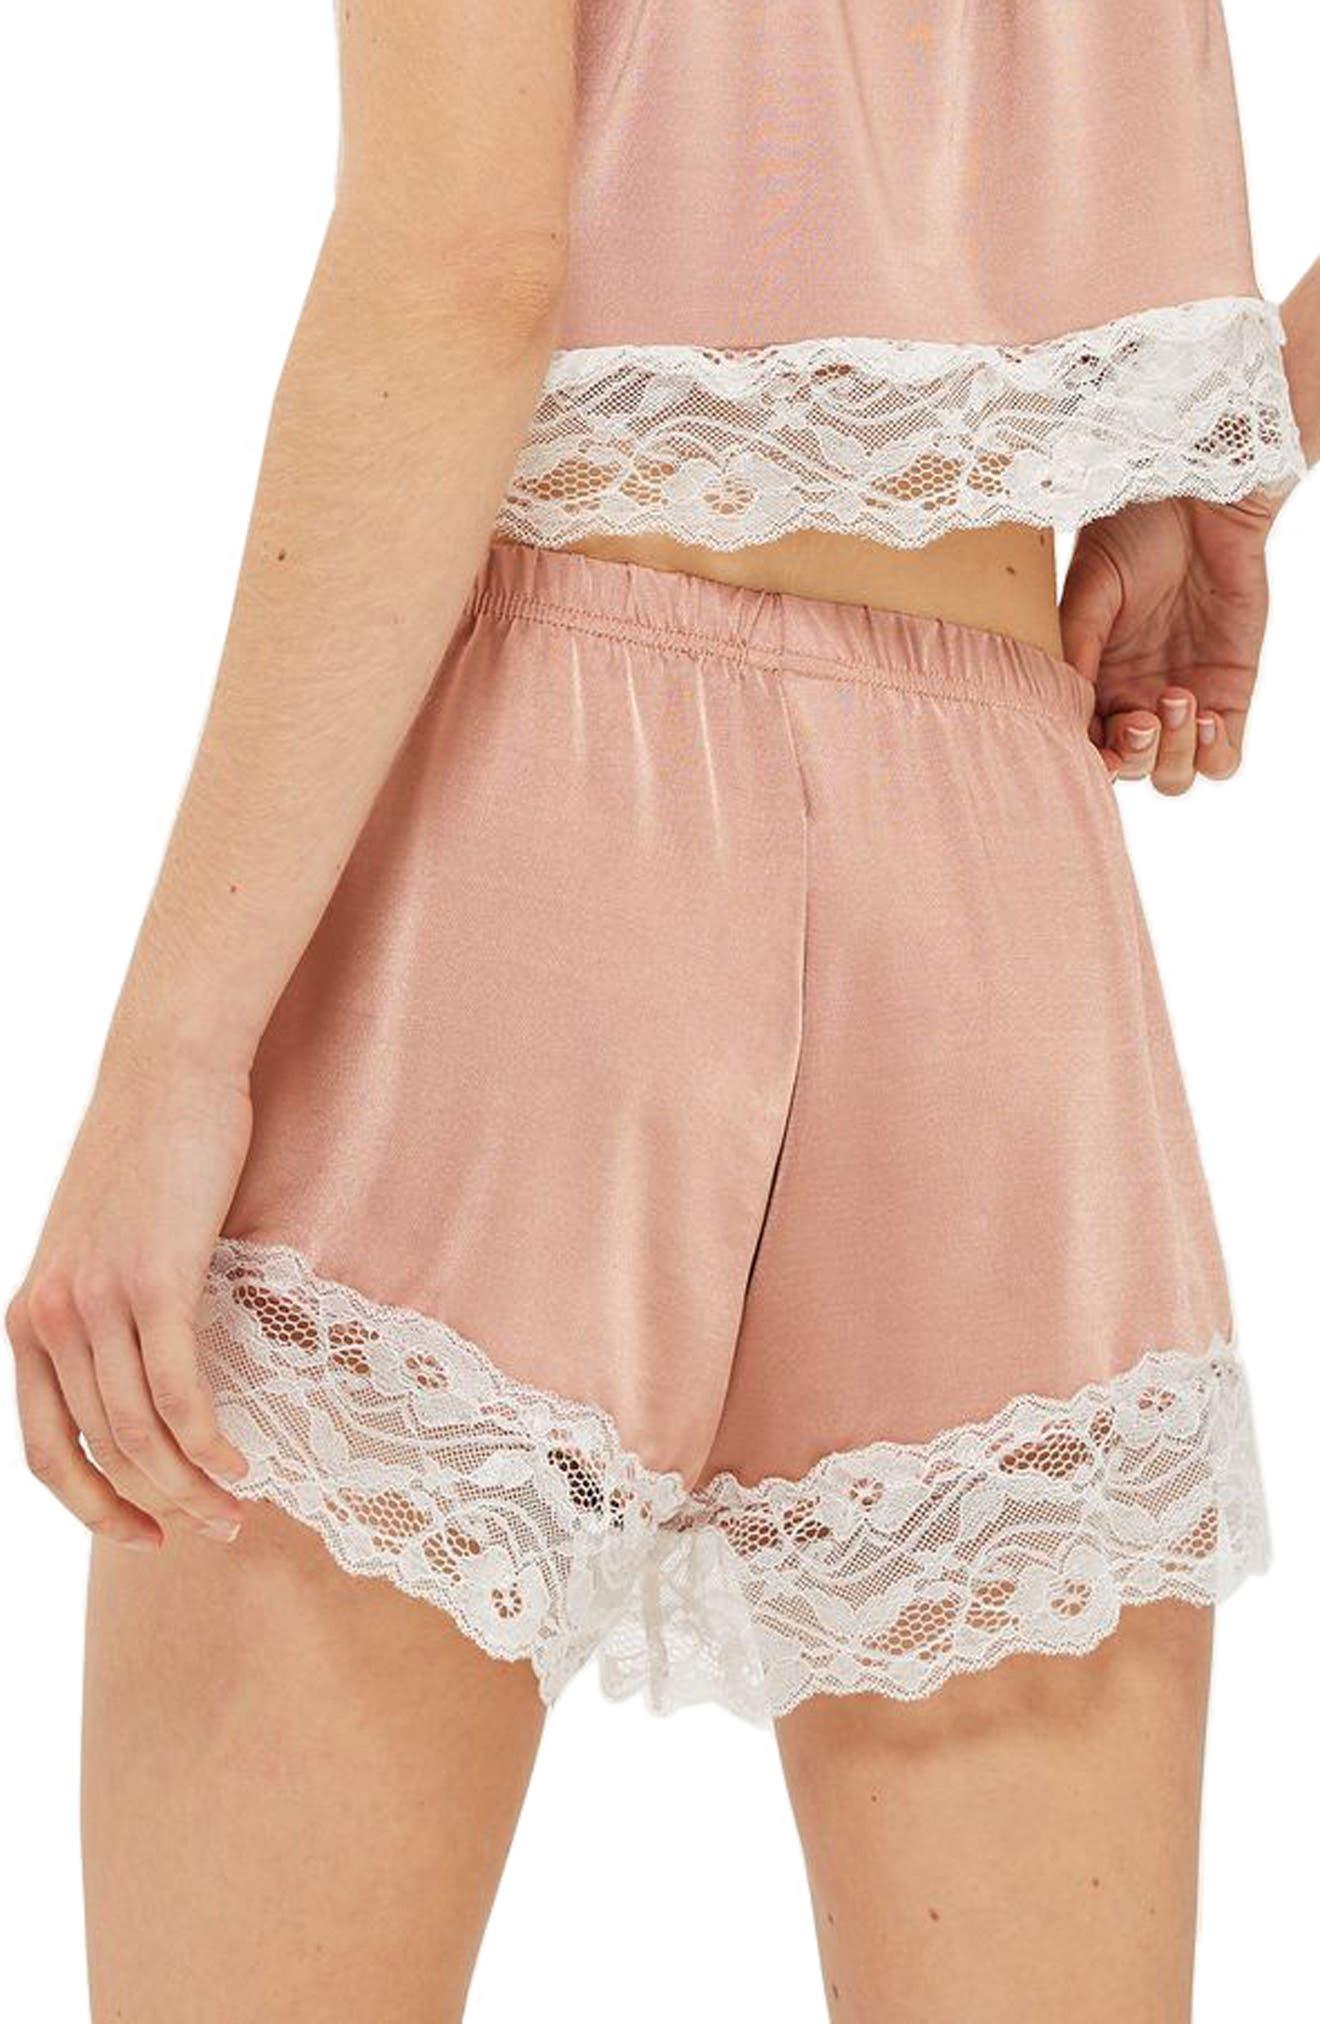 Satin & Lace Pajama Shorts,                             Alternate thumbnail 2, color,                             250